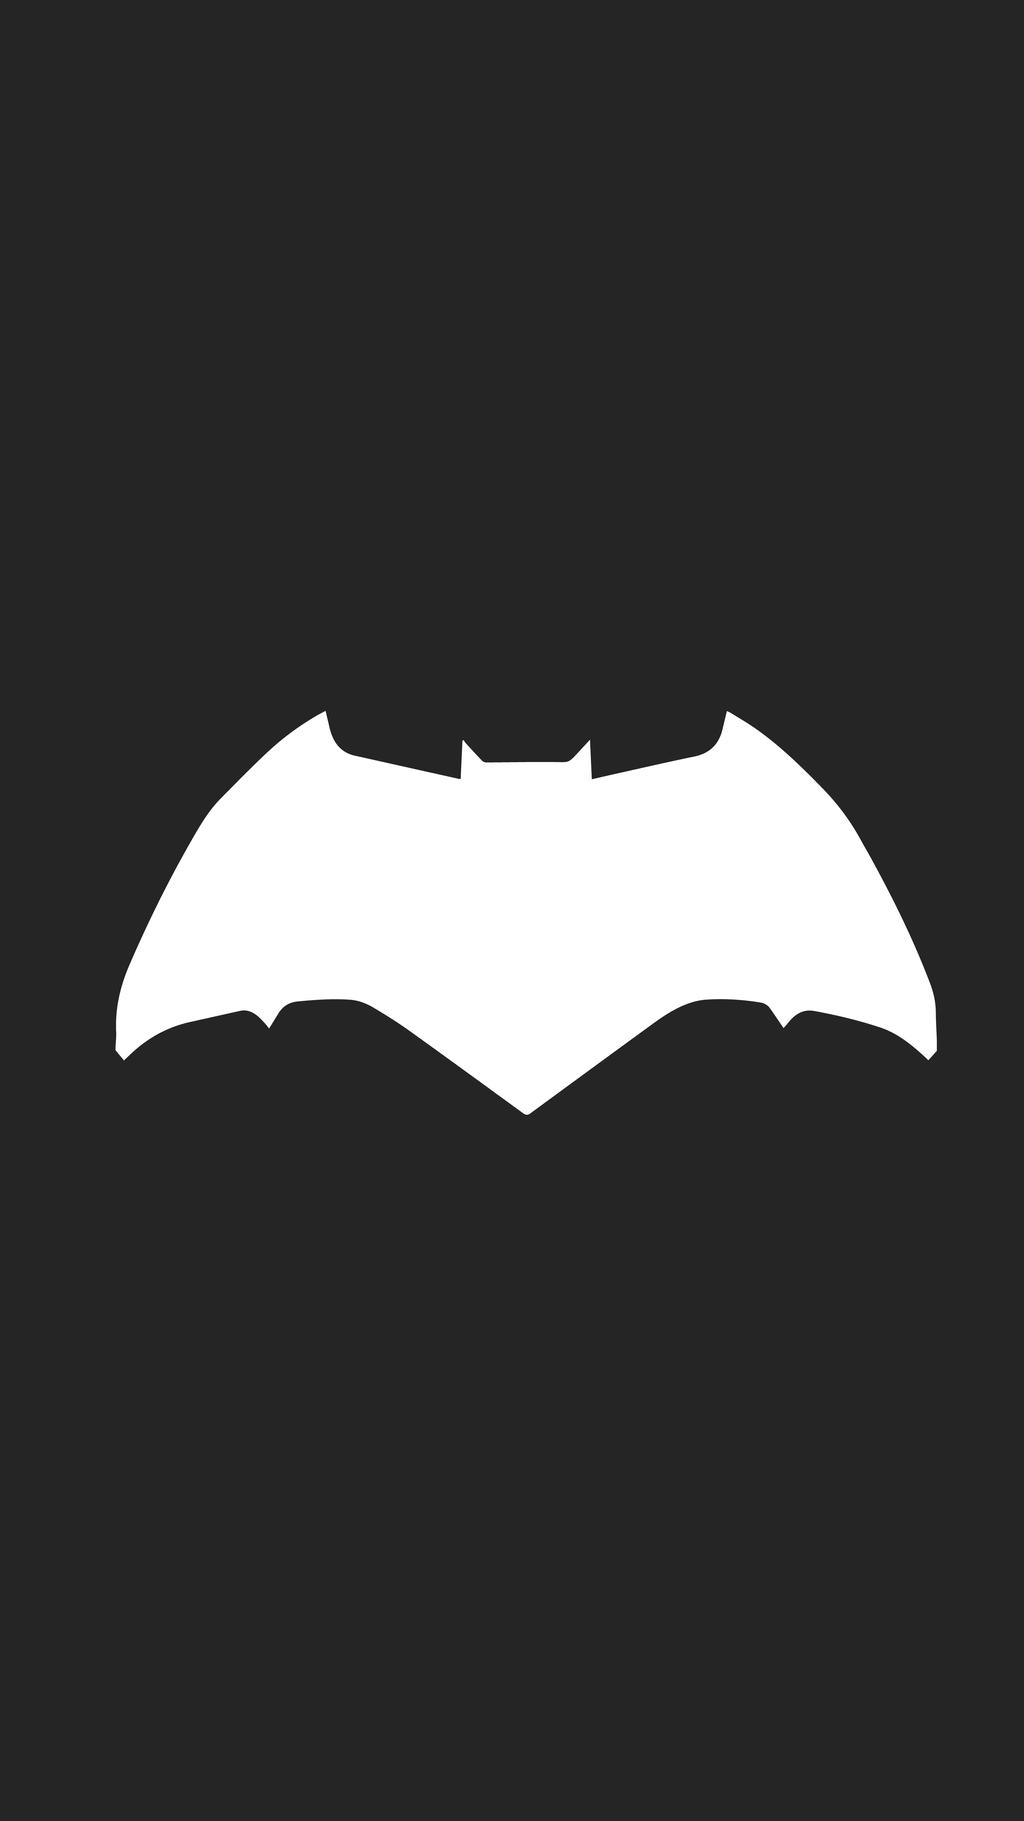 Justice League Batman Wallpaper Mobile By Darkfailure On Deviantart